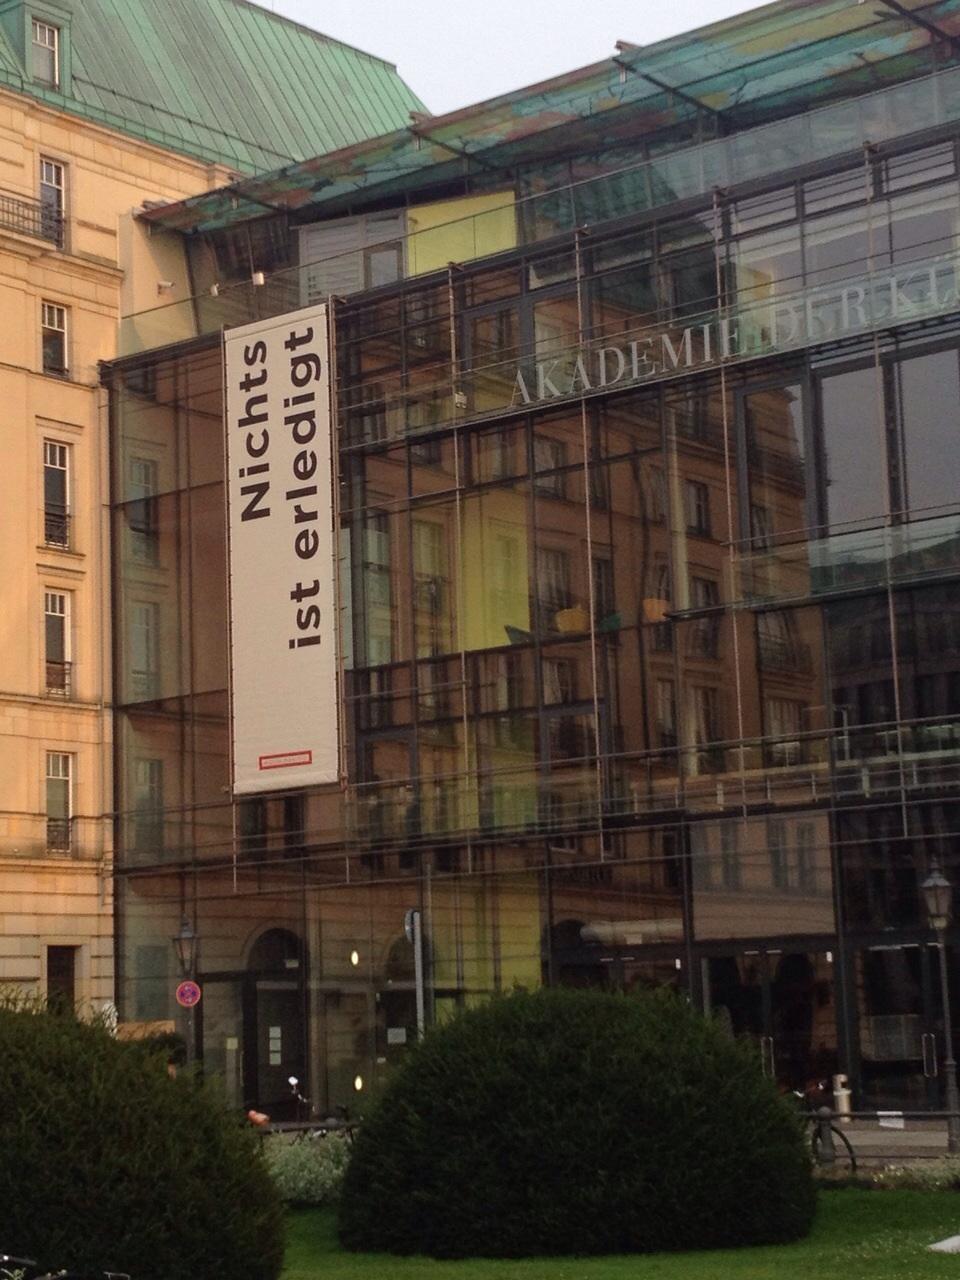 AkademiederKünste, Pariser Platz4, 10117Berlin